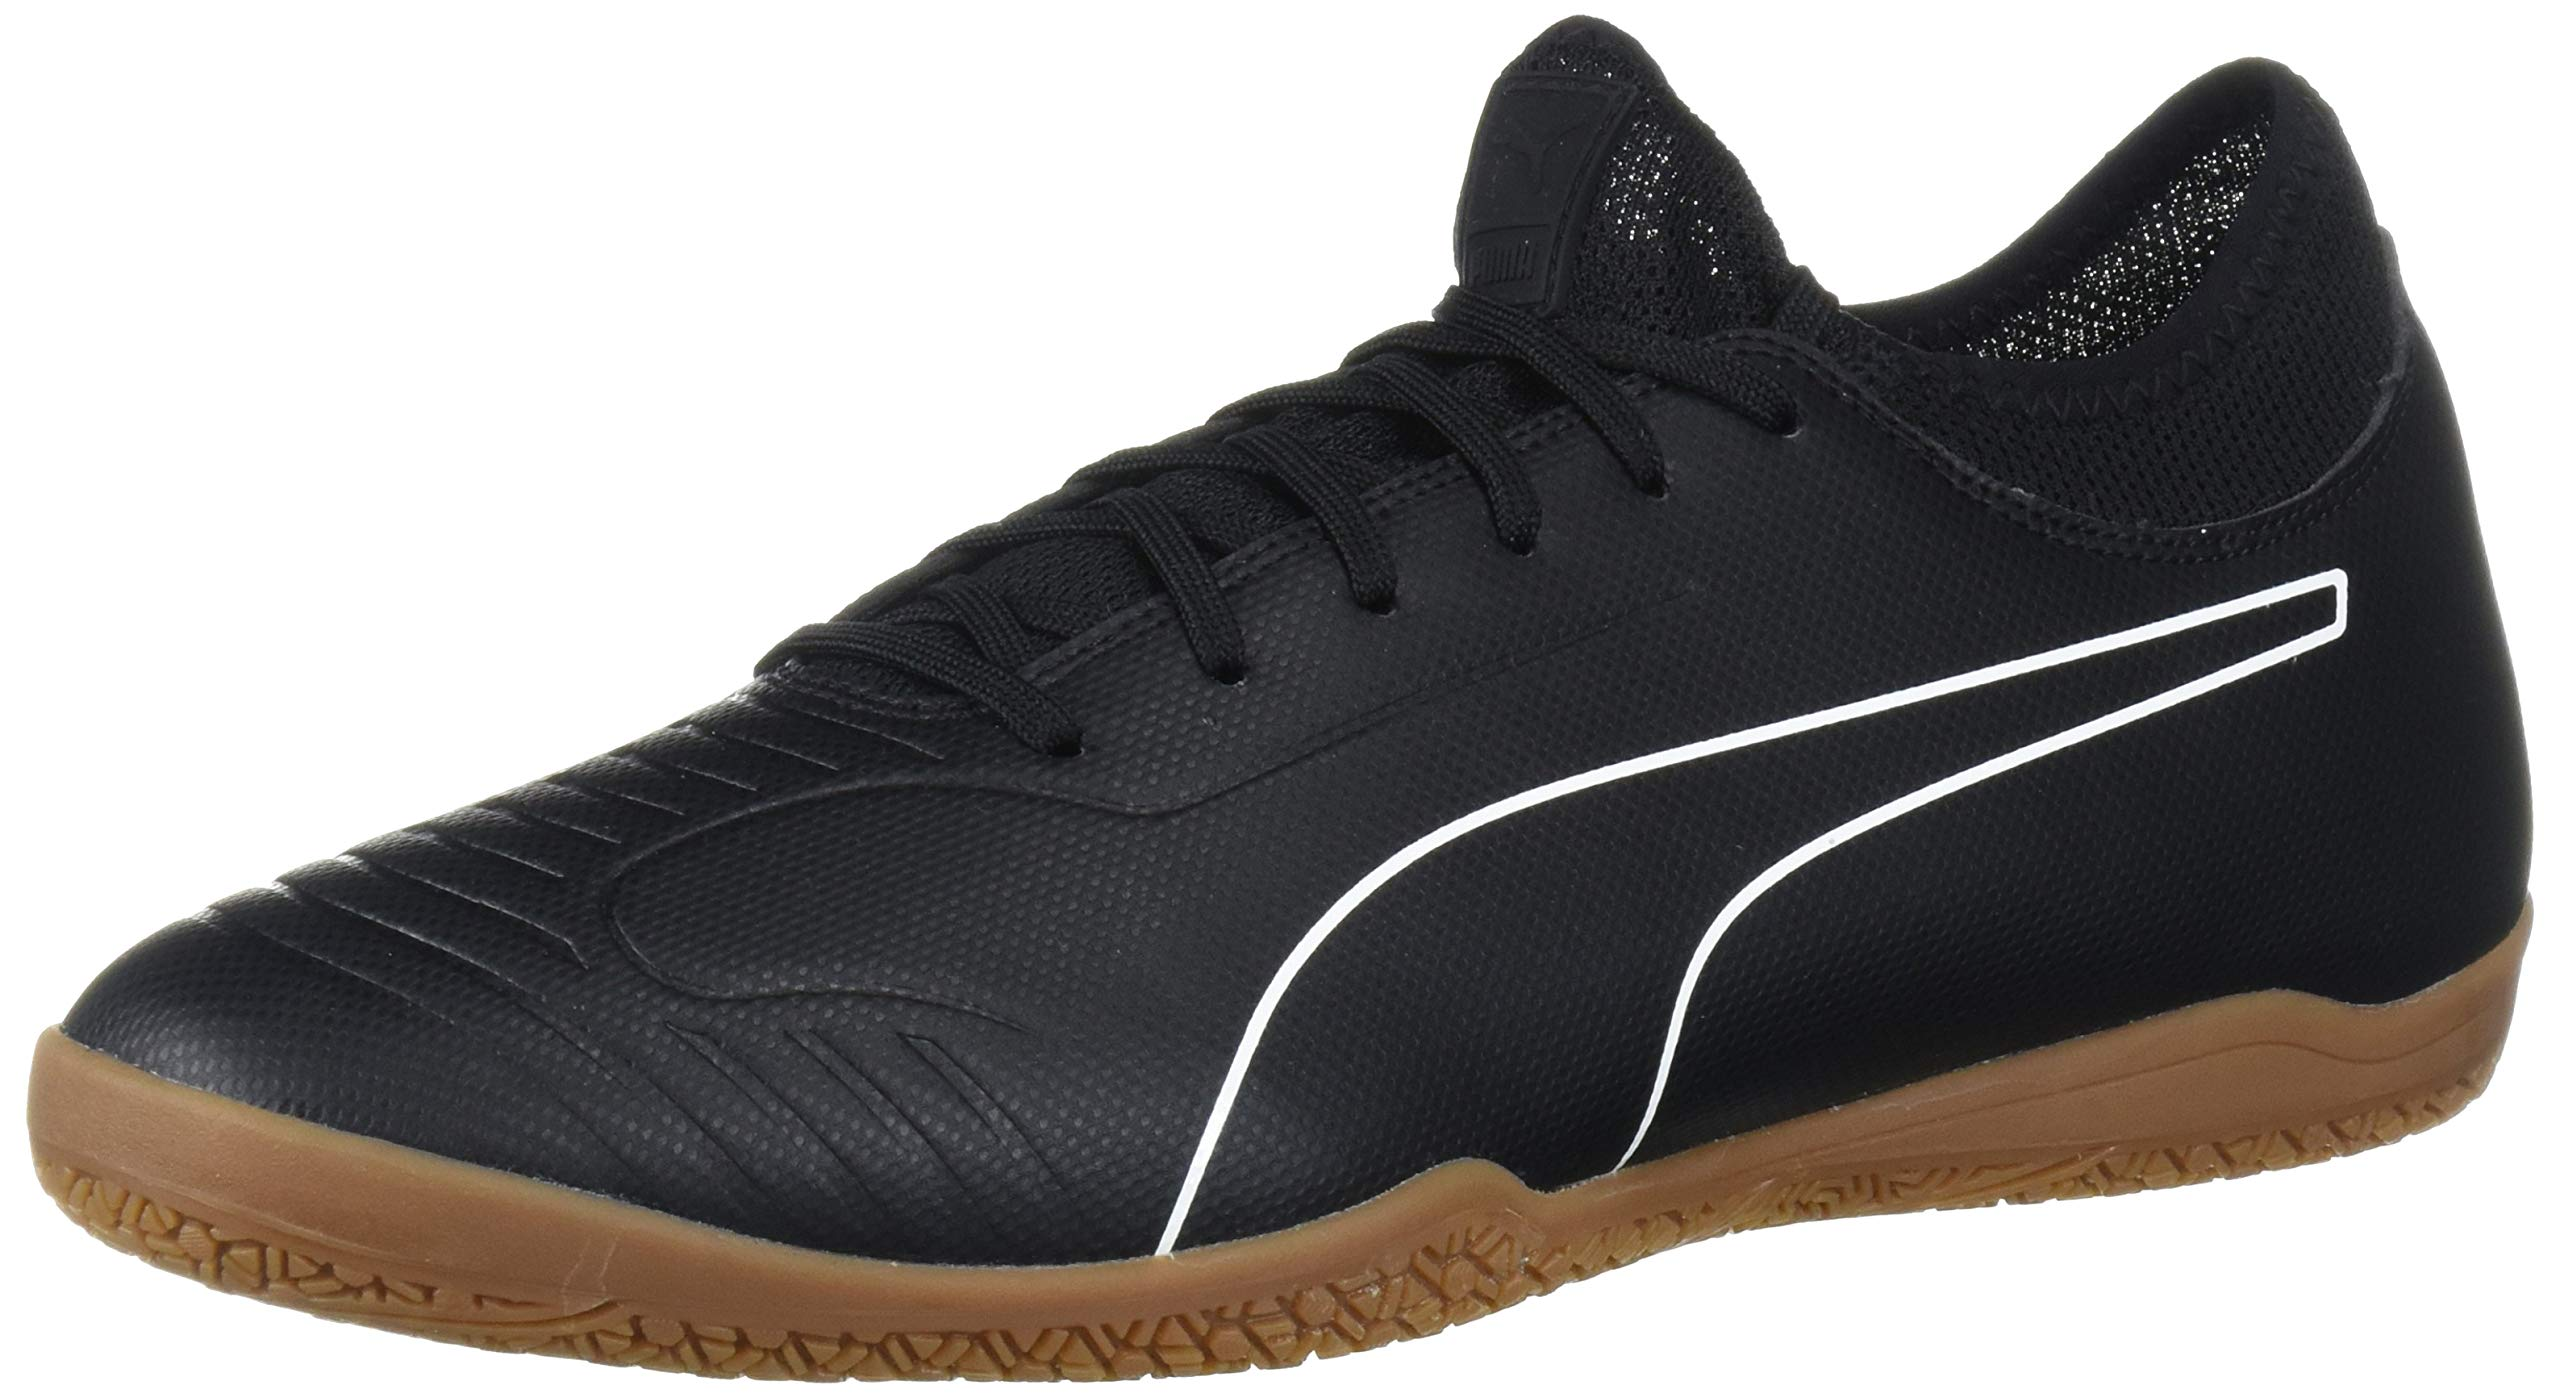 PUMA-Men-039-s-365-Sala-2-Sneaker-Color-01-PUMA-BLACK-PUMA-WHITE-GUM thumbnail 2